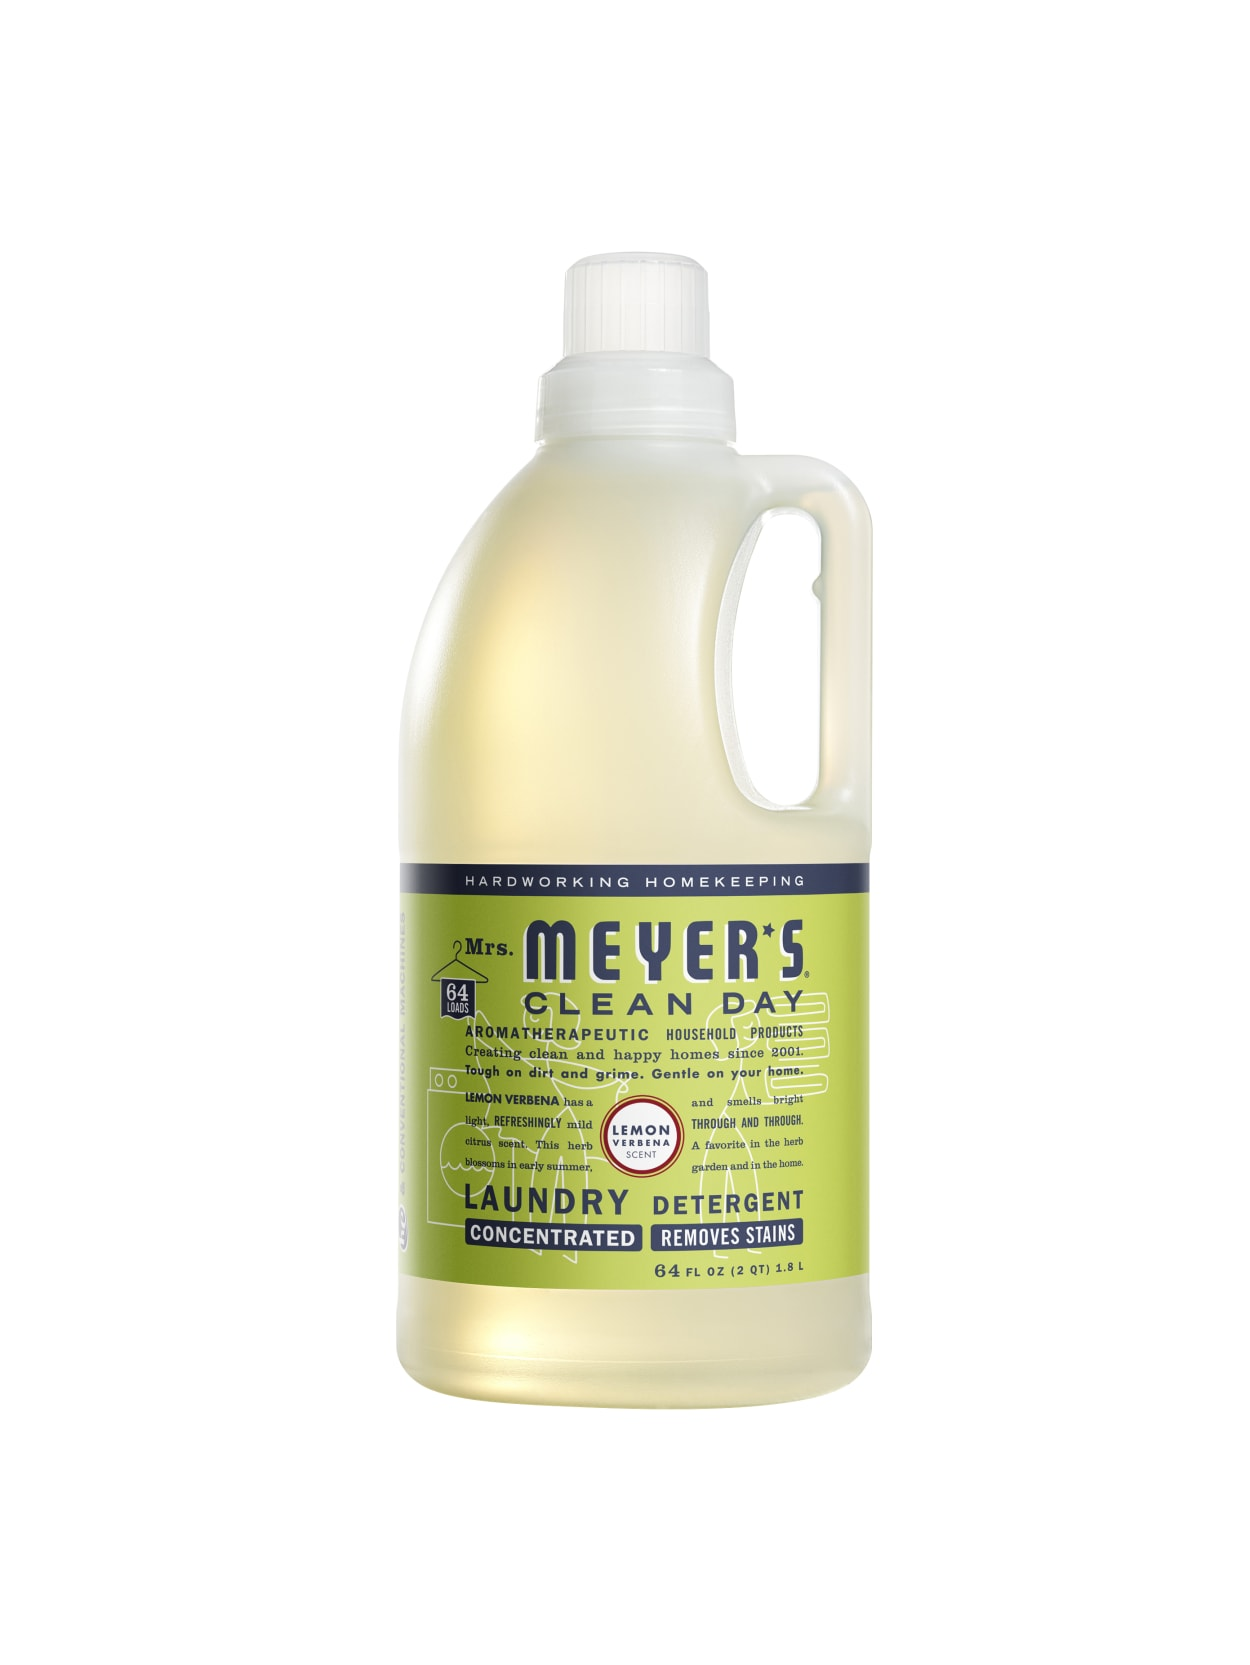 Mrs Meyers Clean Day Lemon Detergent 64 Oz Office Depot